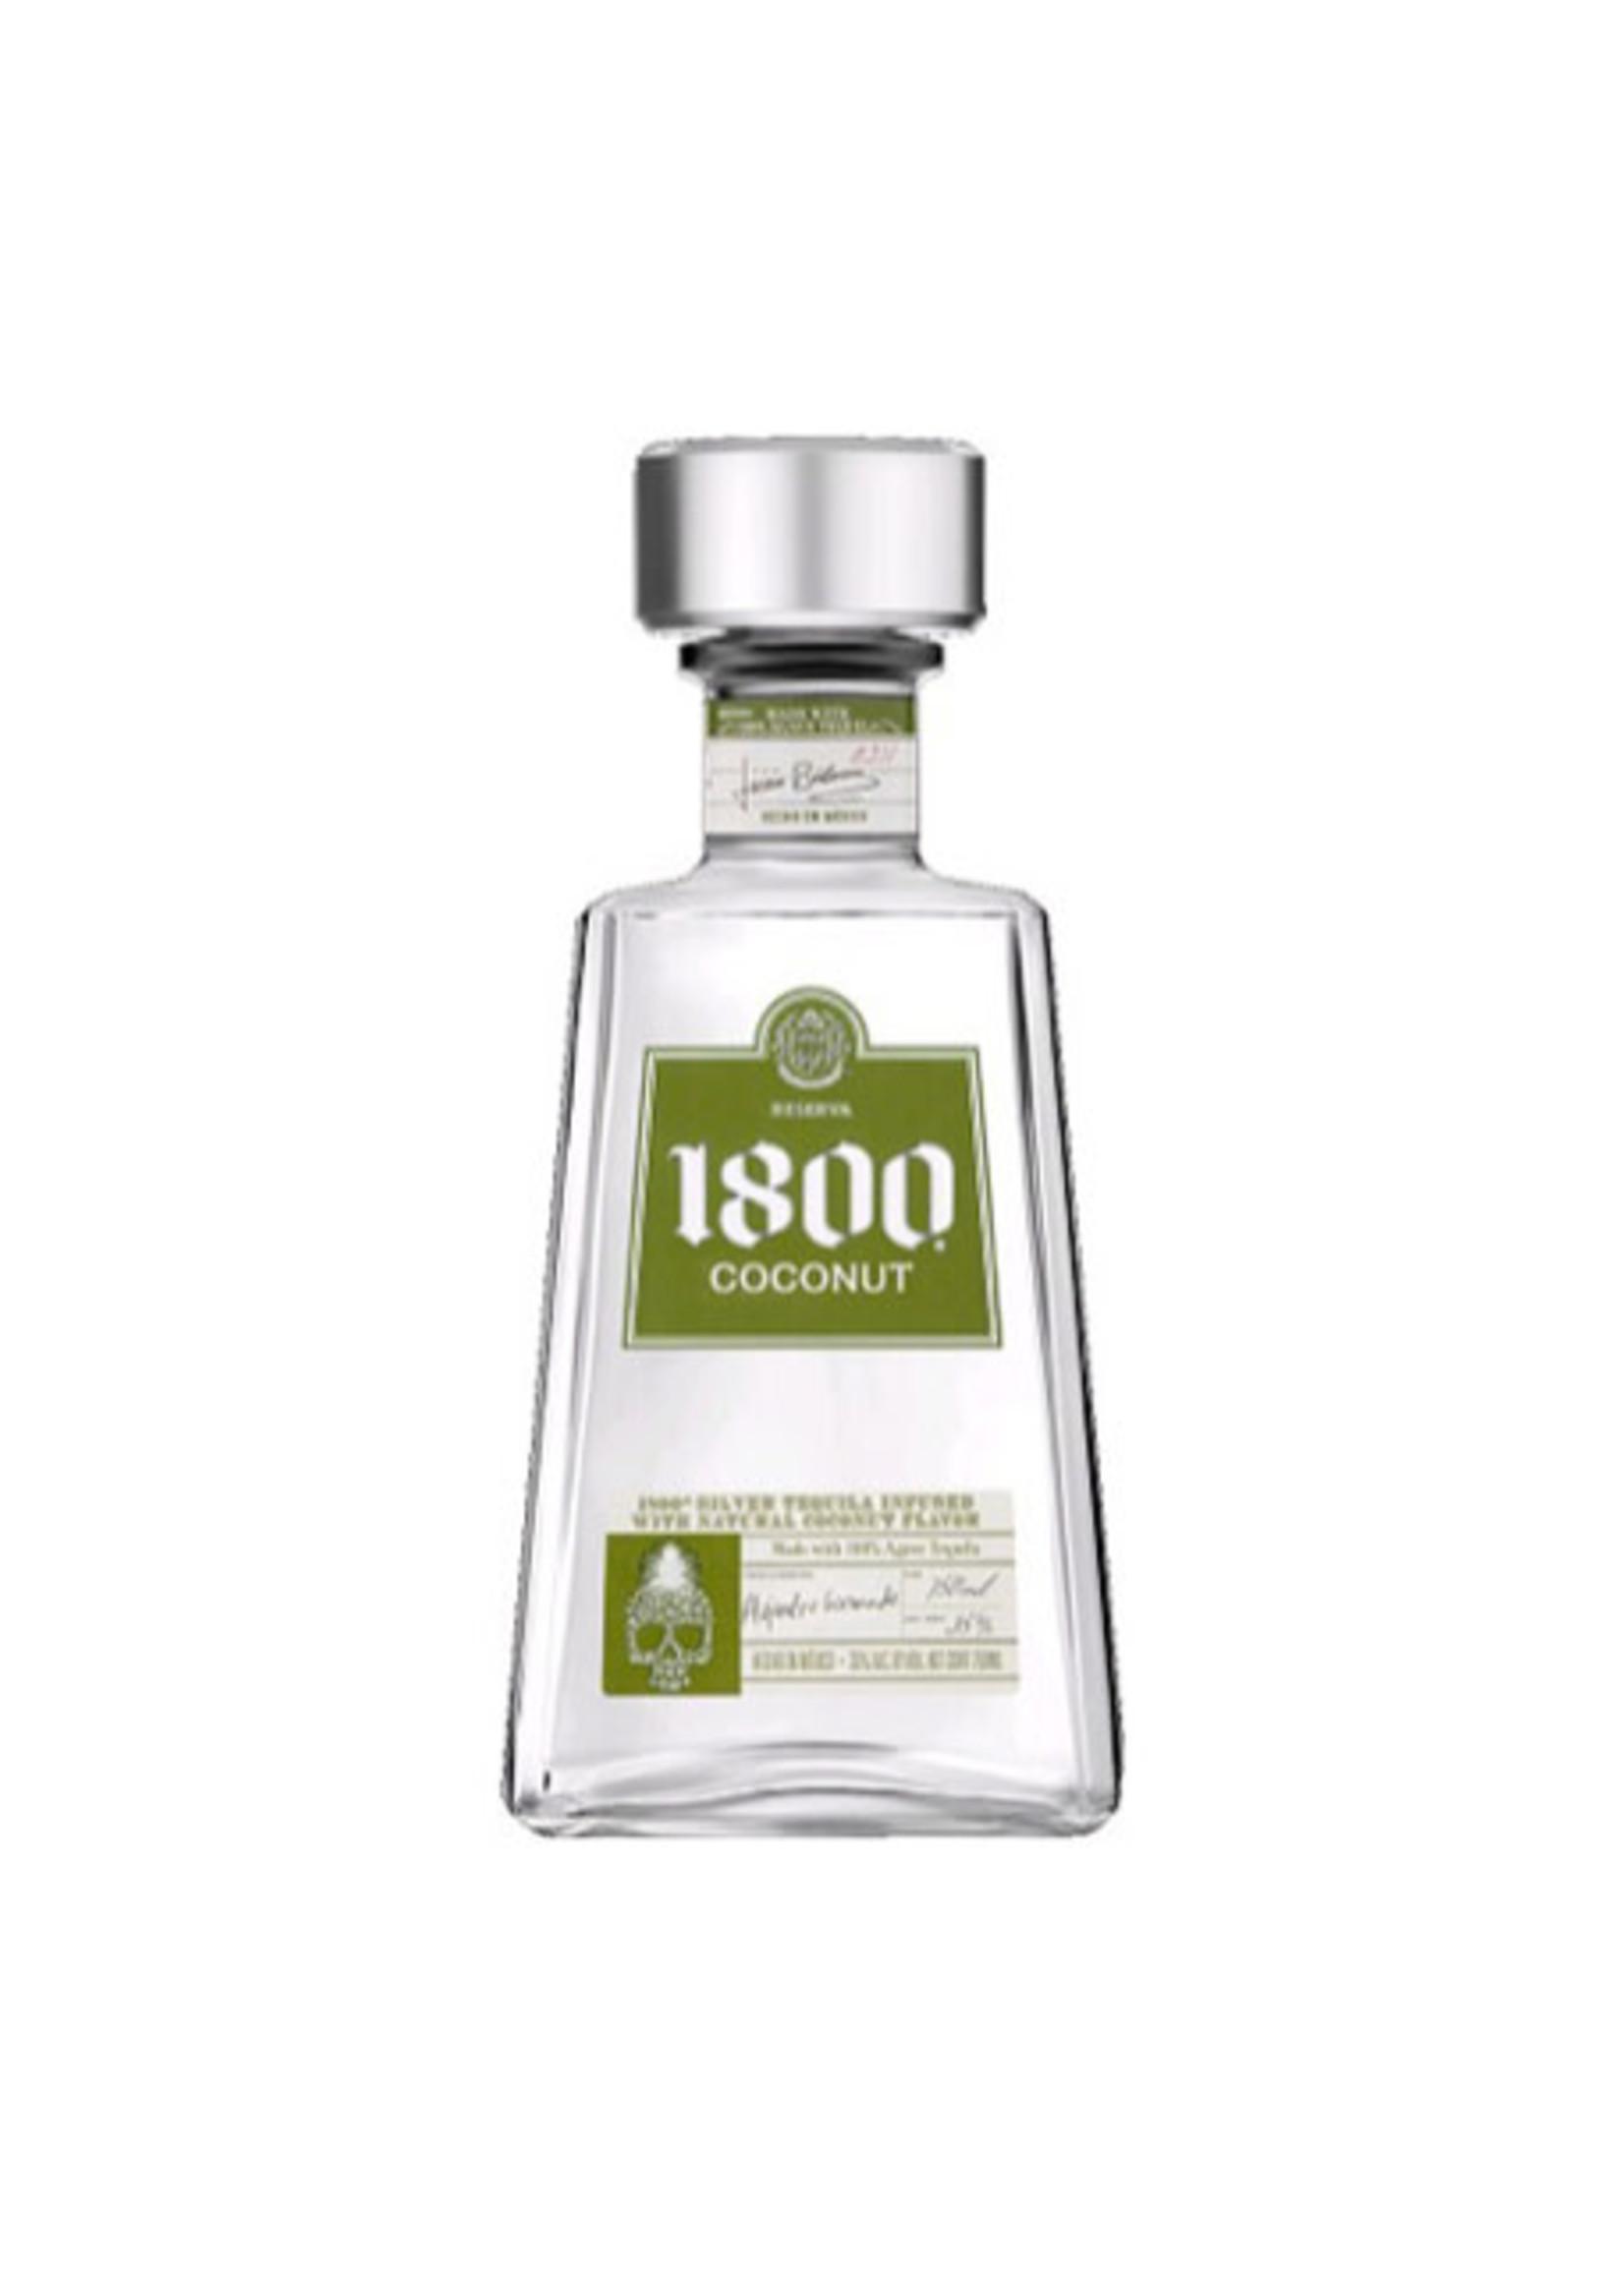 1800 Tequila COCONUT 375mL